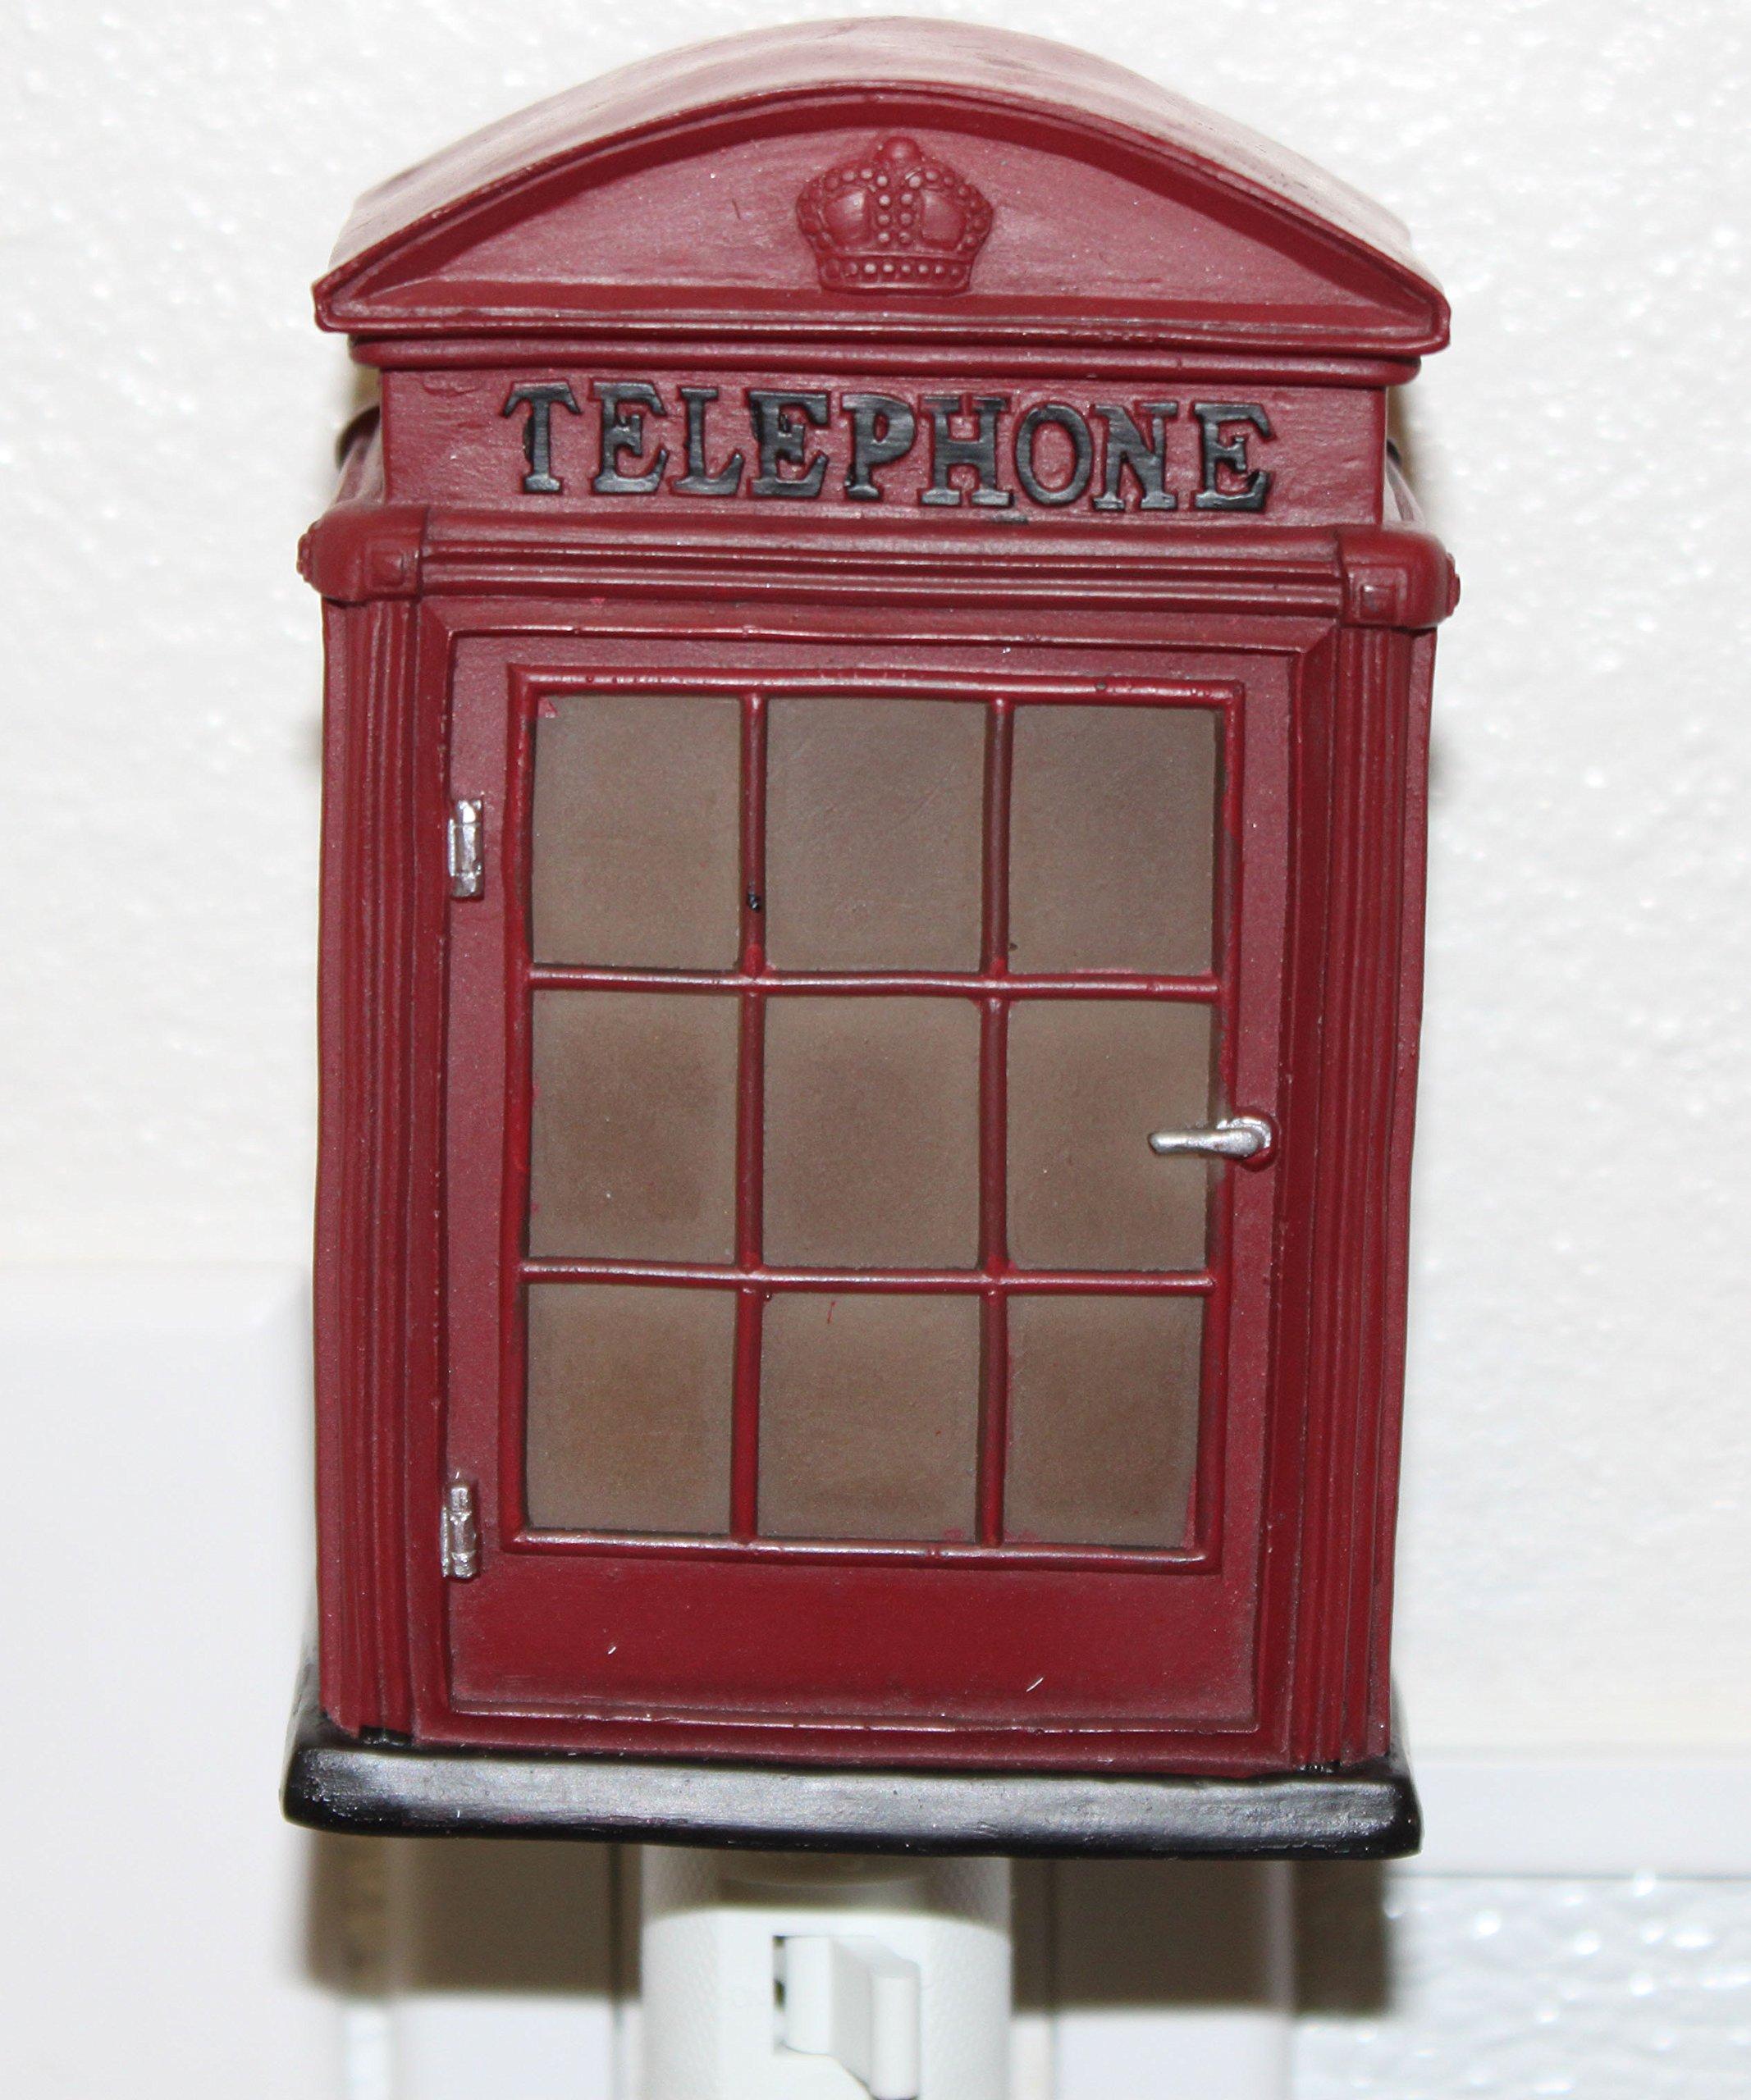 London Phone Booth Retro Nightlight Lamp Candle Home Decor Congratulatory Blessing Souvenir Gift US Seller (London Phone Booth -CN92)